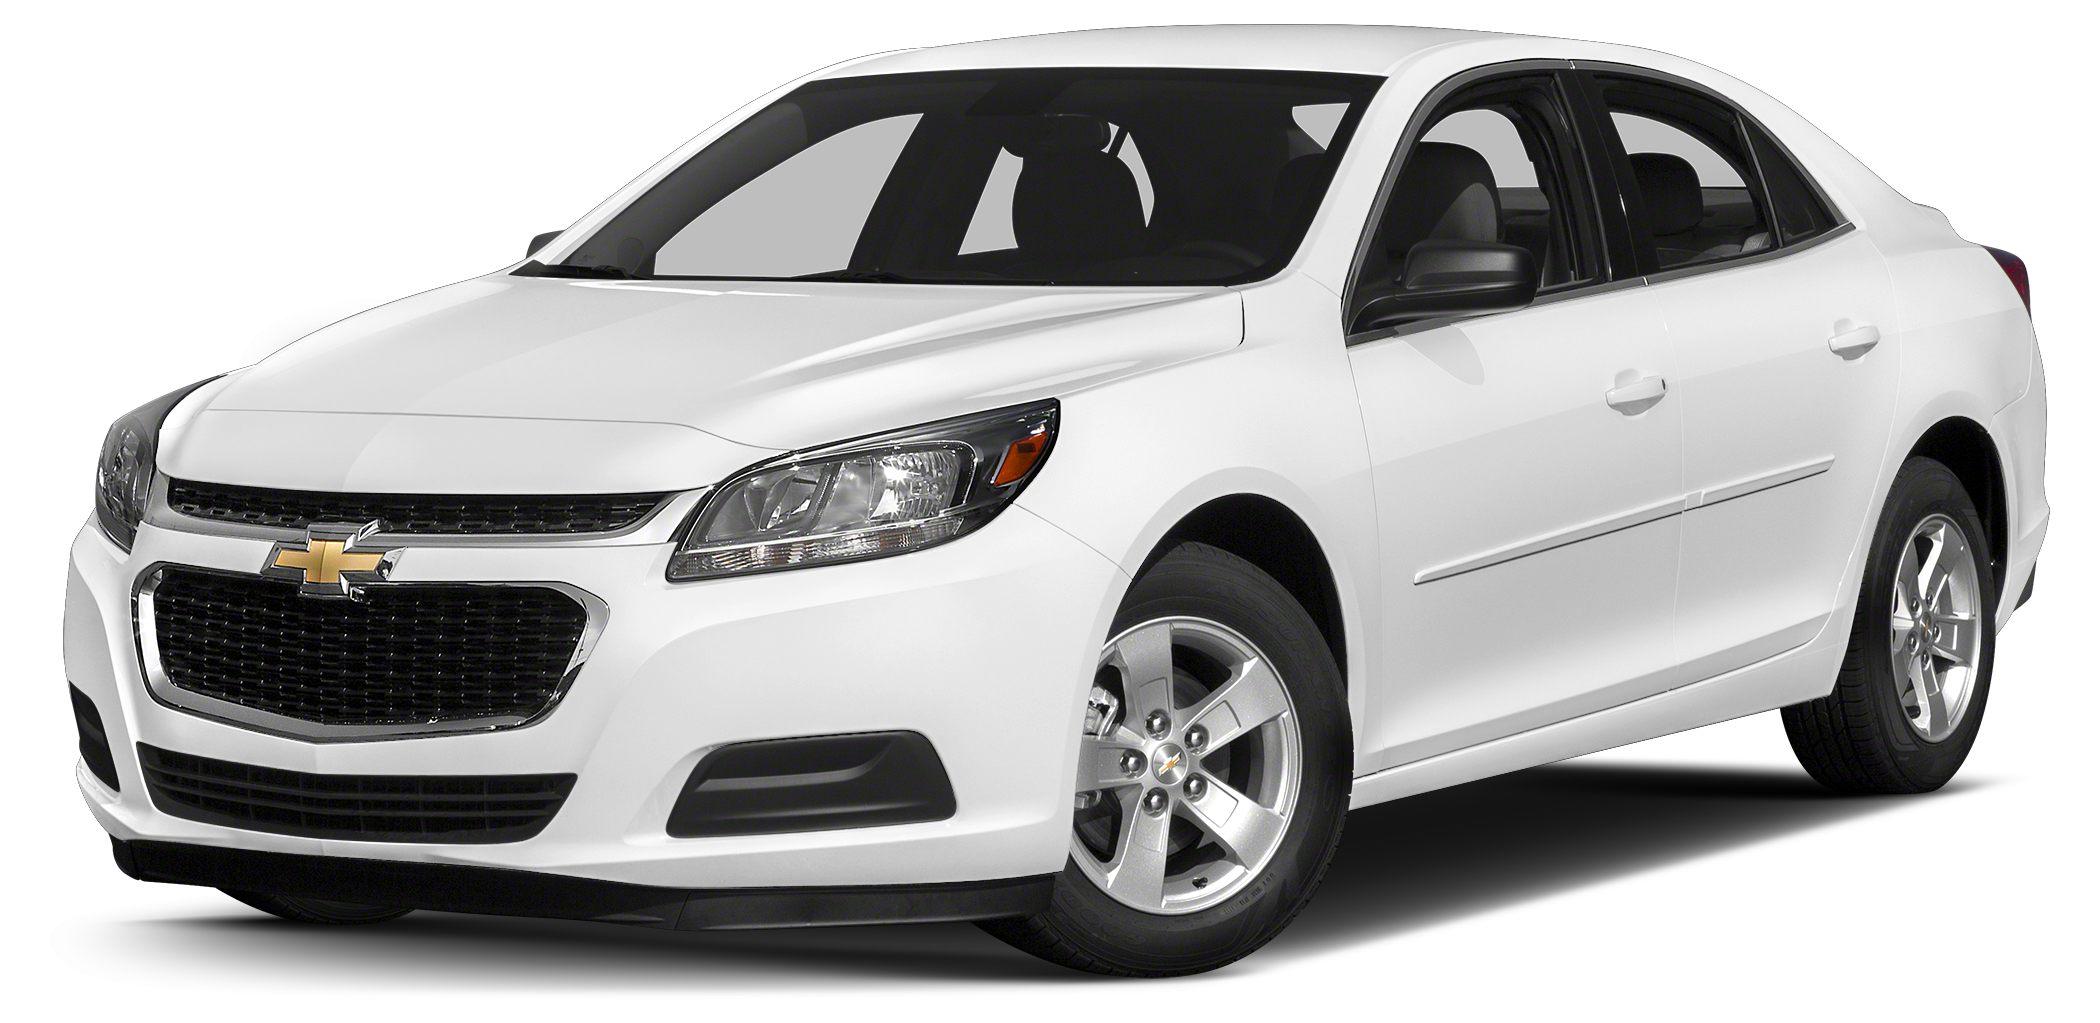 2014 Chevrolet Malibu LS w1LS LS trim Excellent Condition EPA 36 MPG Hwy25 MPG City AUDIO SYS